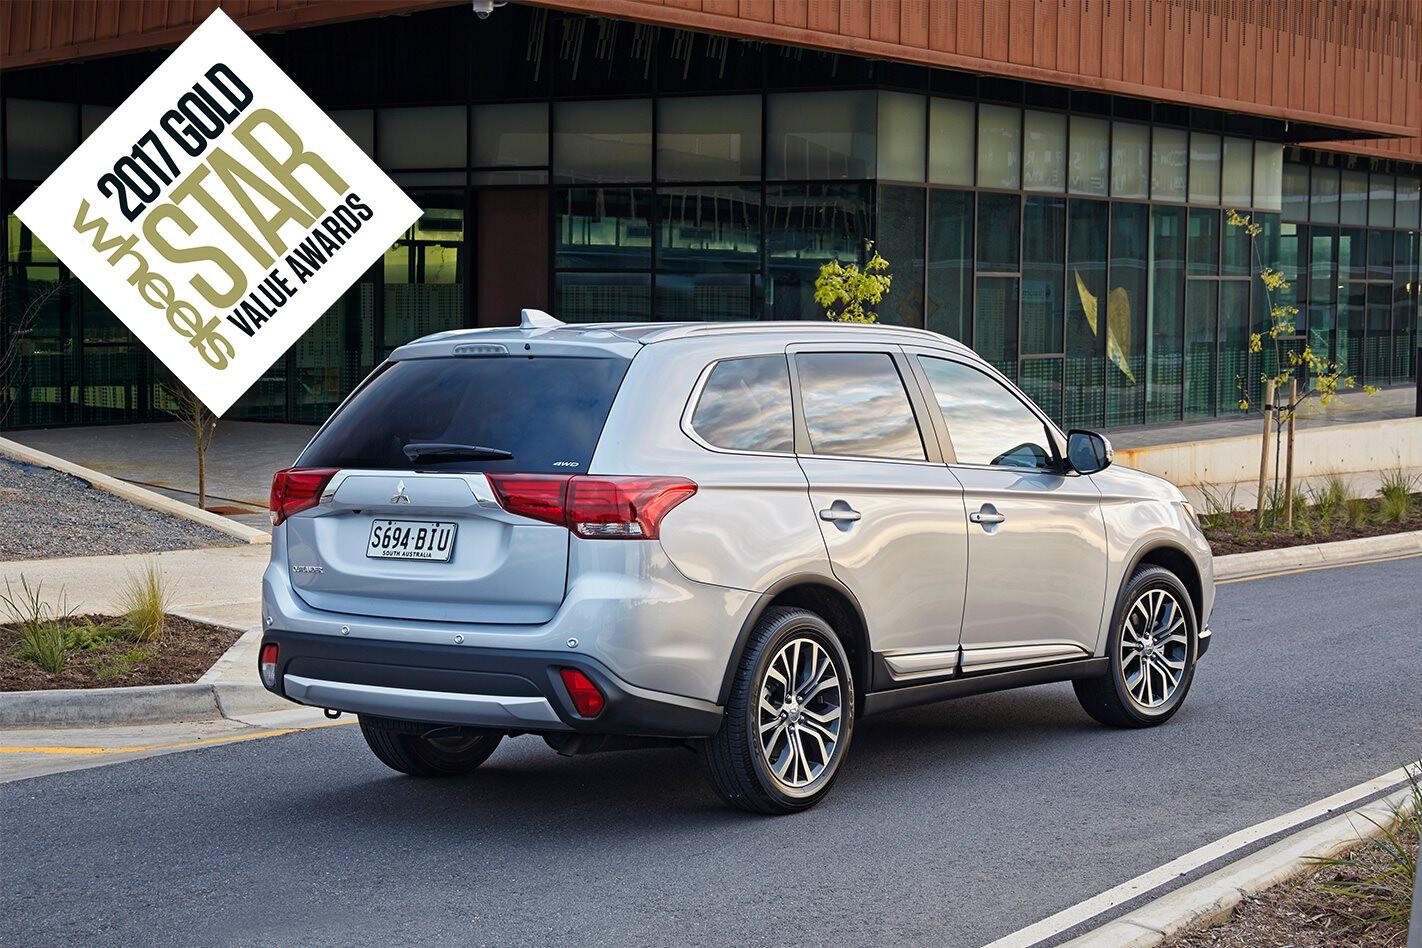 SUV 7-seater under 60K Australia's Best Value Cars 2017